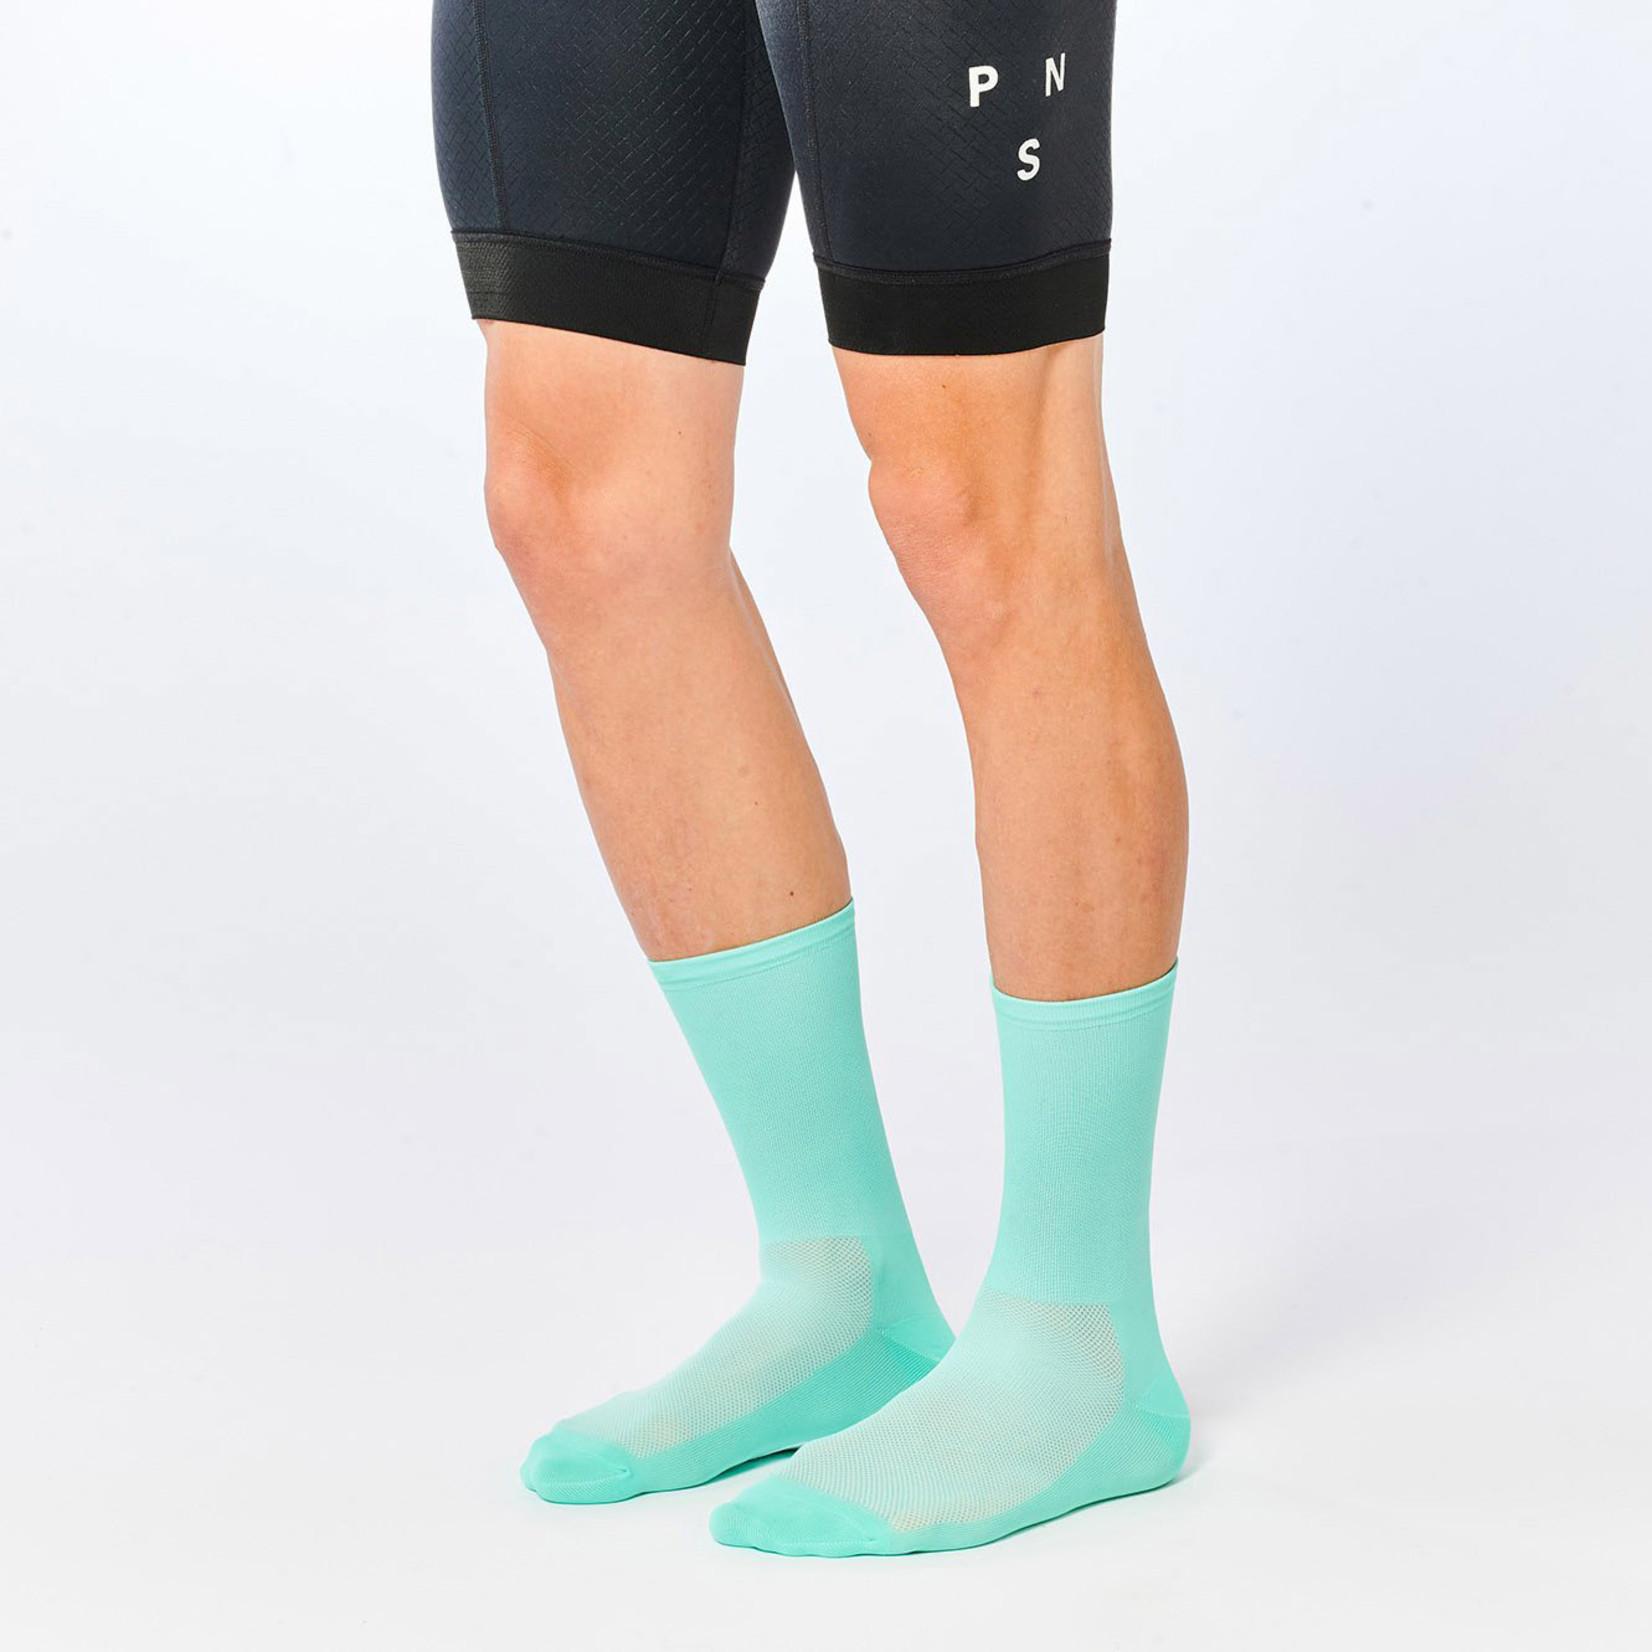 Fingerscrossed FINGERSCROSSED Classic Socks - Celeste